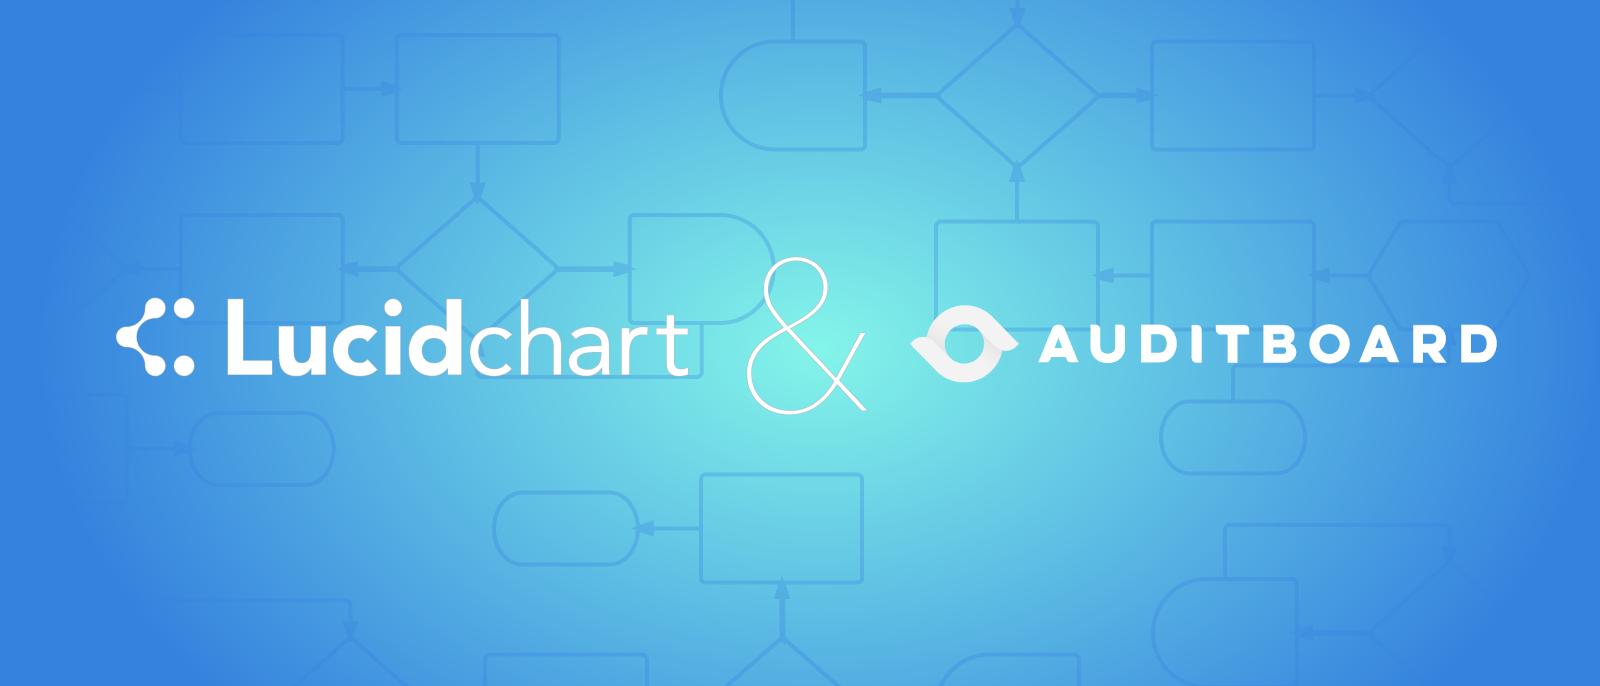 AuditBoard integration